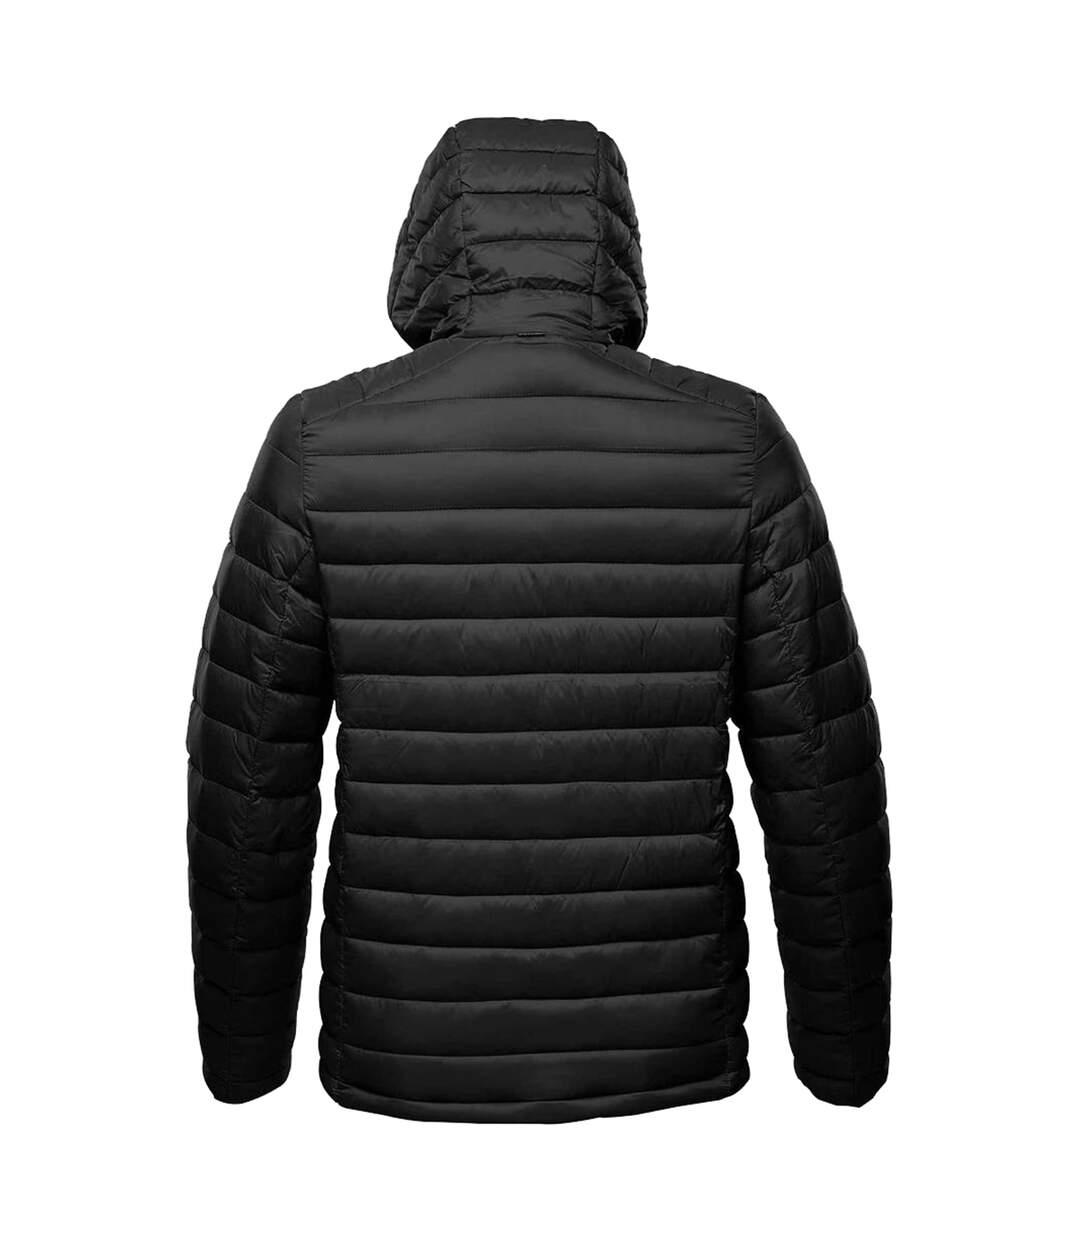 Stormtech Mens Gravity Hooded Thermal Winter Jacket (Durable Water Resistant) (Blue/Black) - UTBC3064